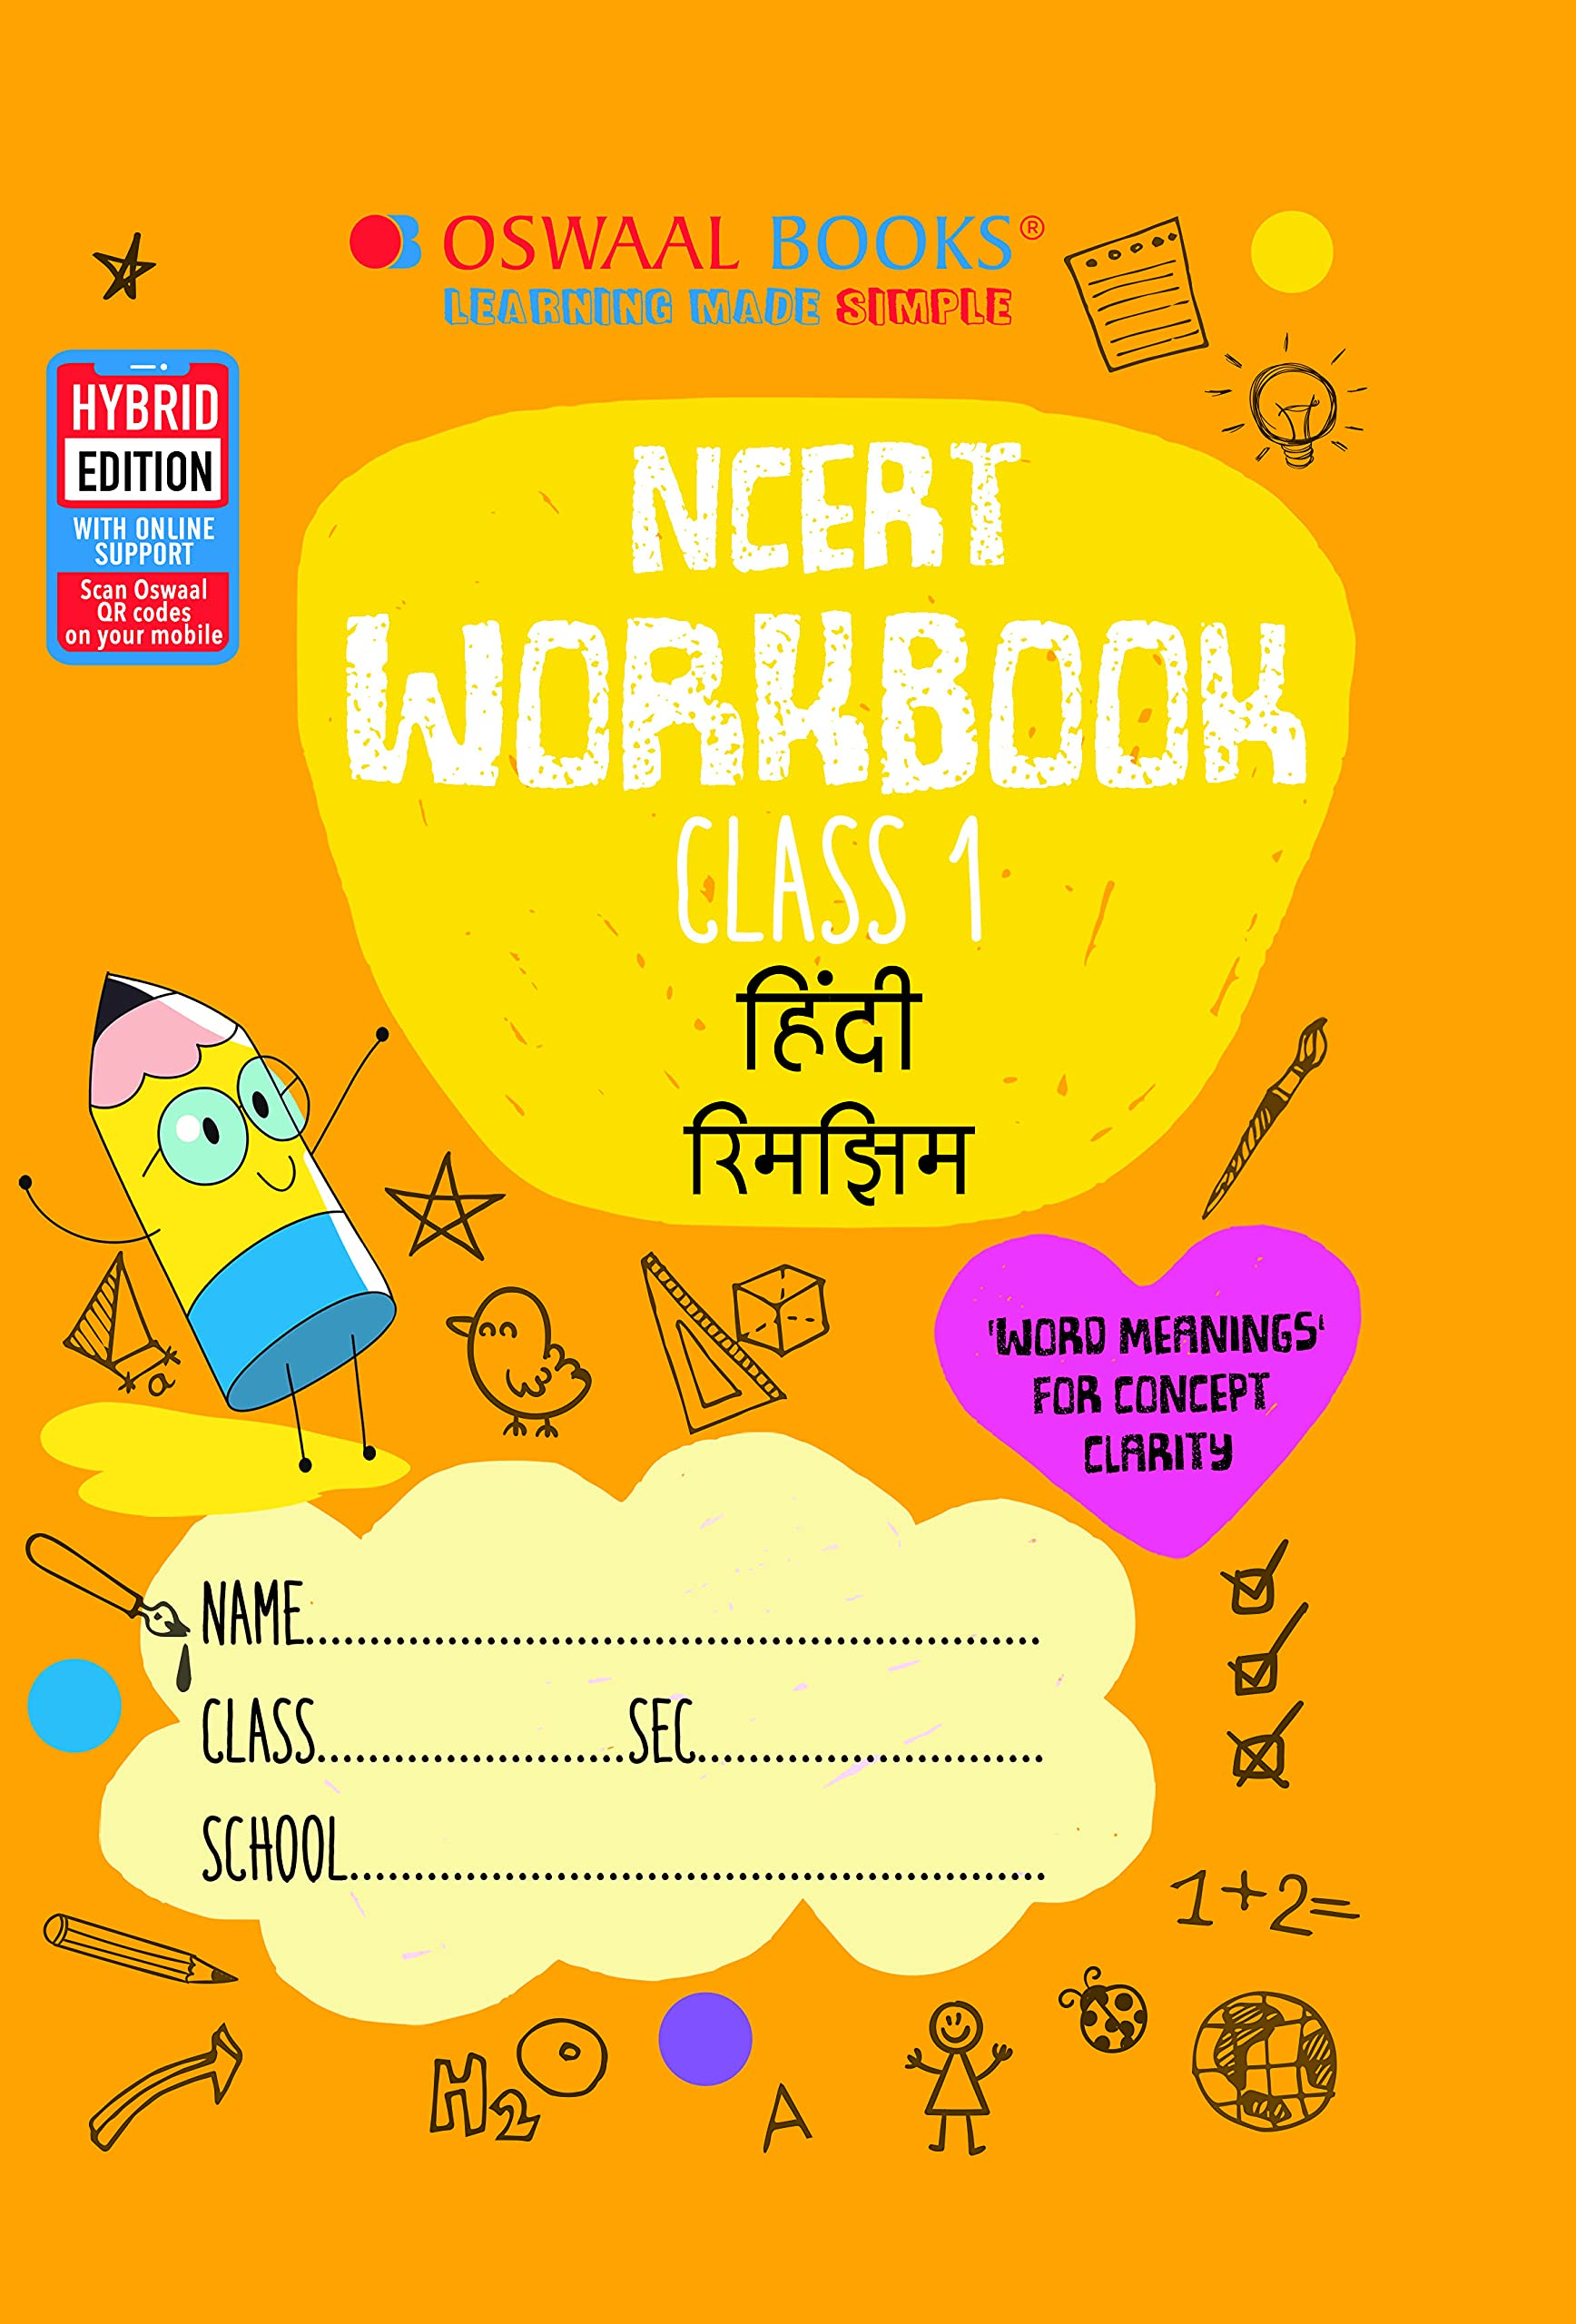 Oswaal NCERT Workbook Class 1, Hindi (For 2022 Exam)